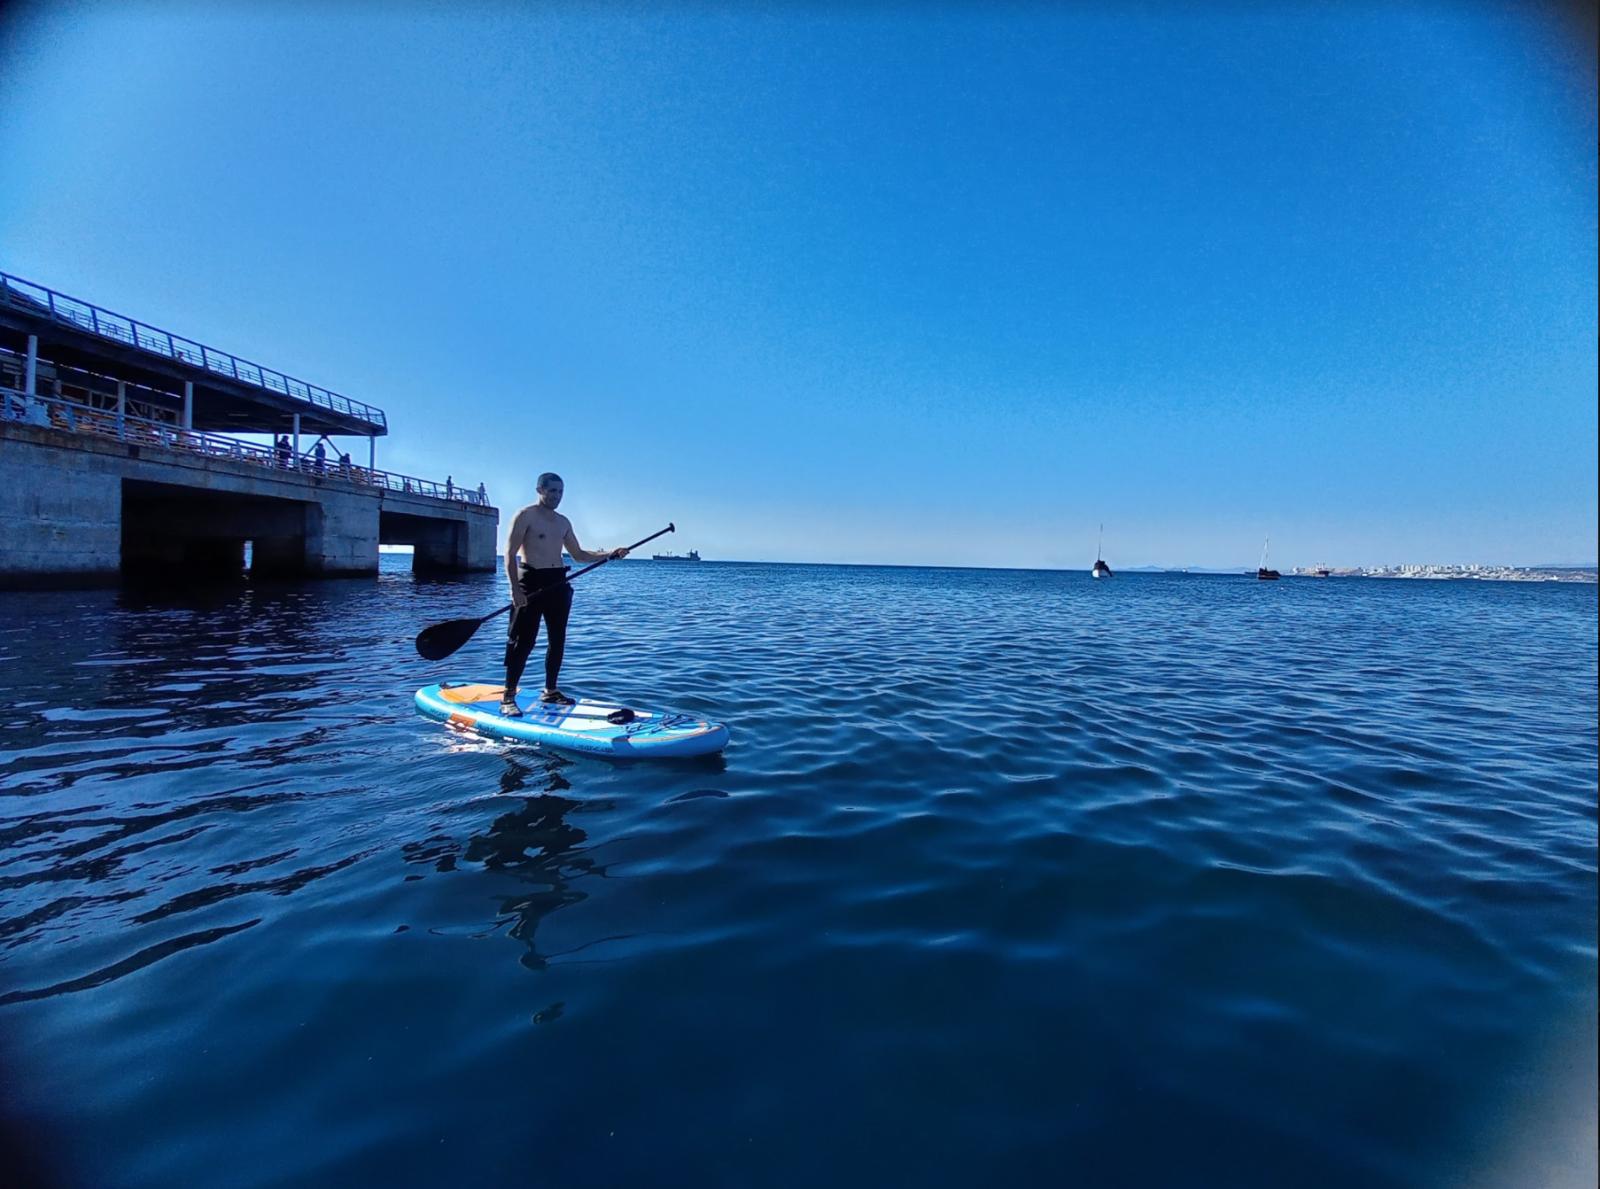 Arriendo de Stand-Up Paddle (SUP) en Valparaíso